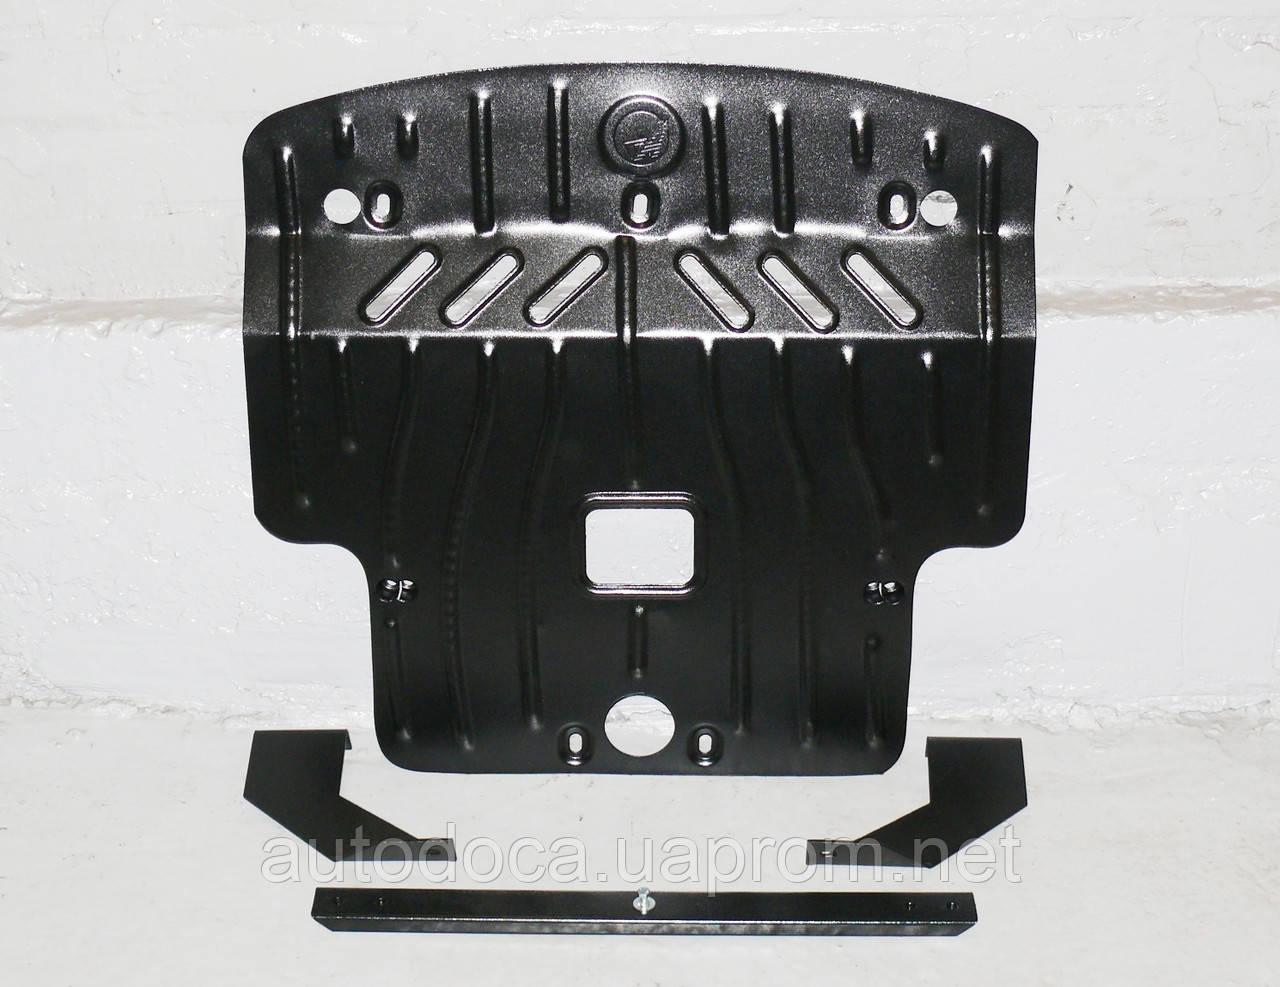 Защита поддона картера двигателя, кпп BMW 7 (E38) 1994-